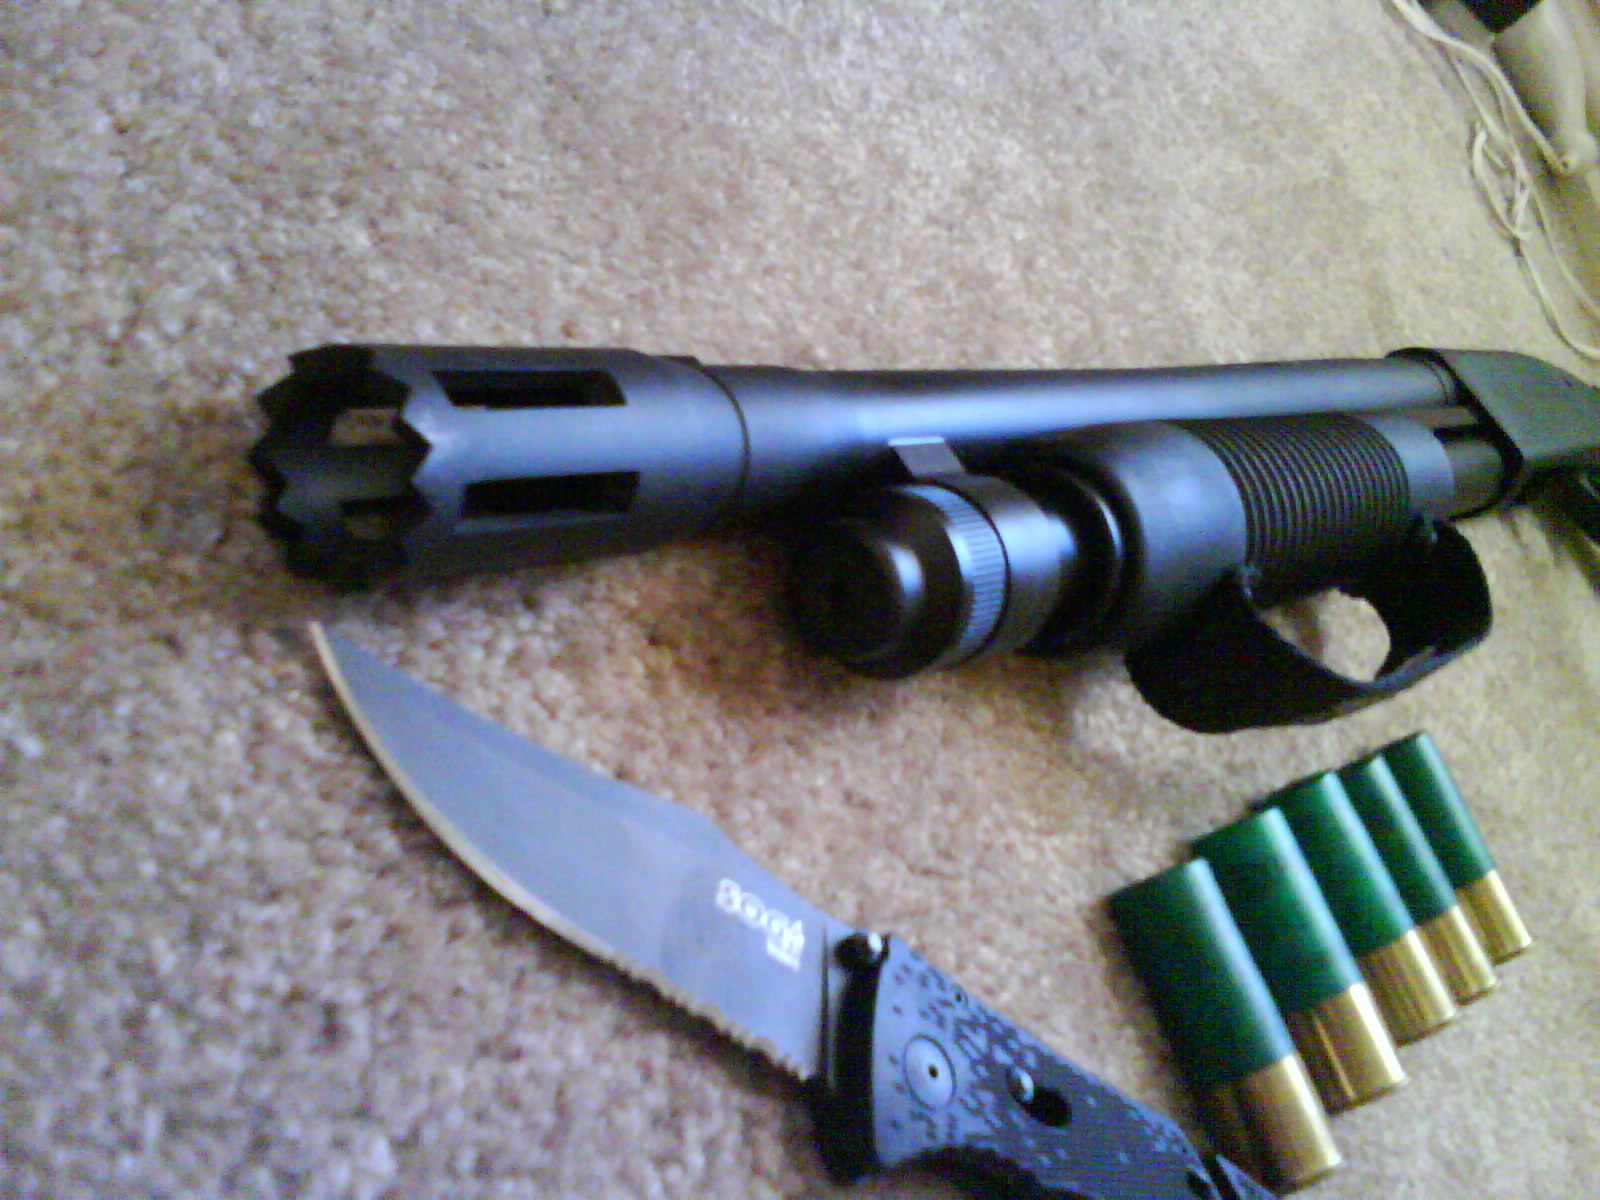 Wife declares g26 too ''wimpy'' for bedside gun-dsc00186.jpg